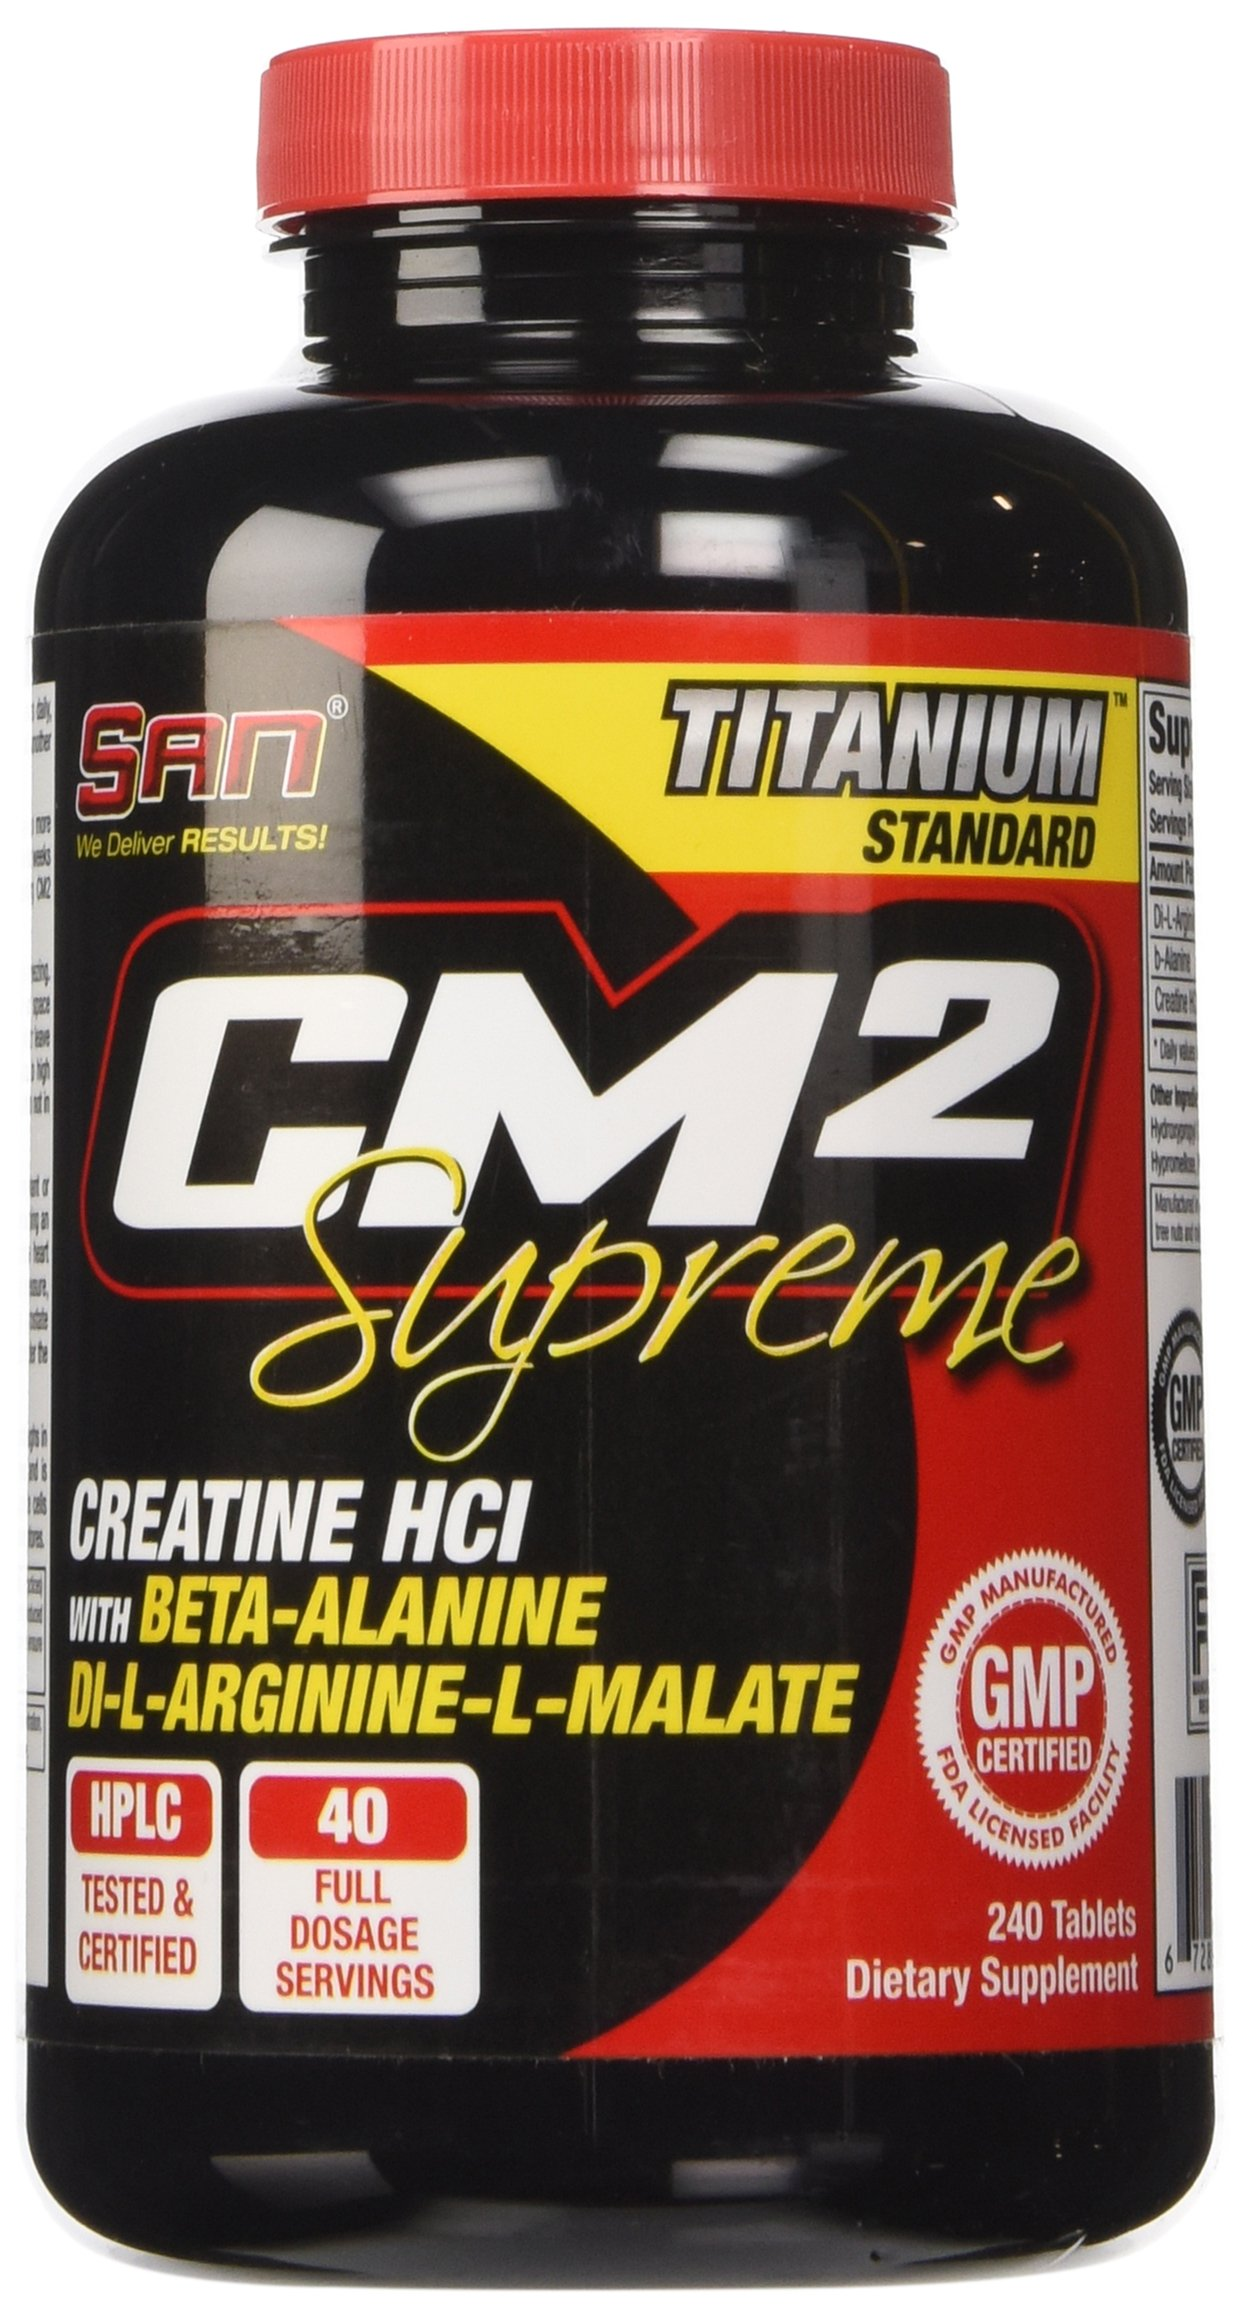 SAN Nutrition CM2 Supreme Creatine Supplement with Beta-Alanine & Di-L-Arginine-L-Malate, 240 Count